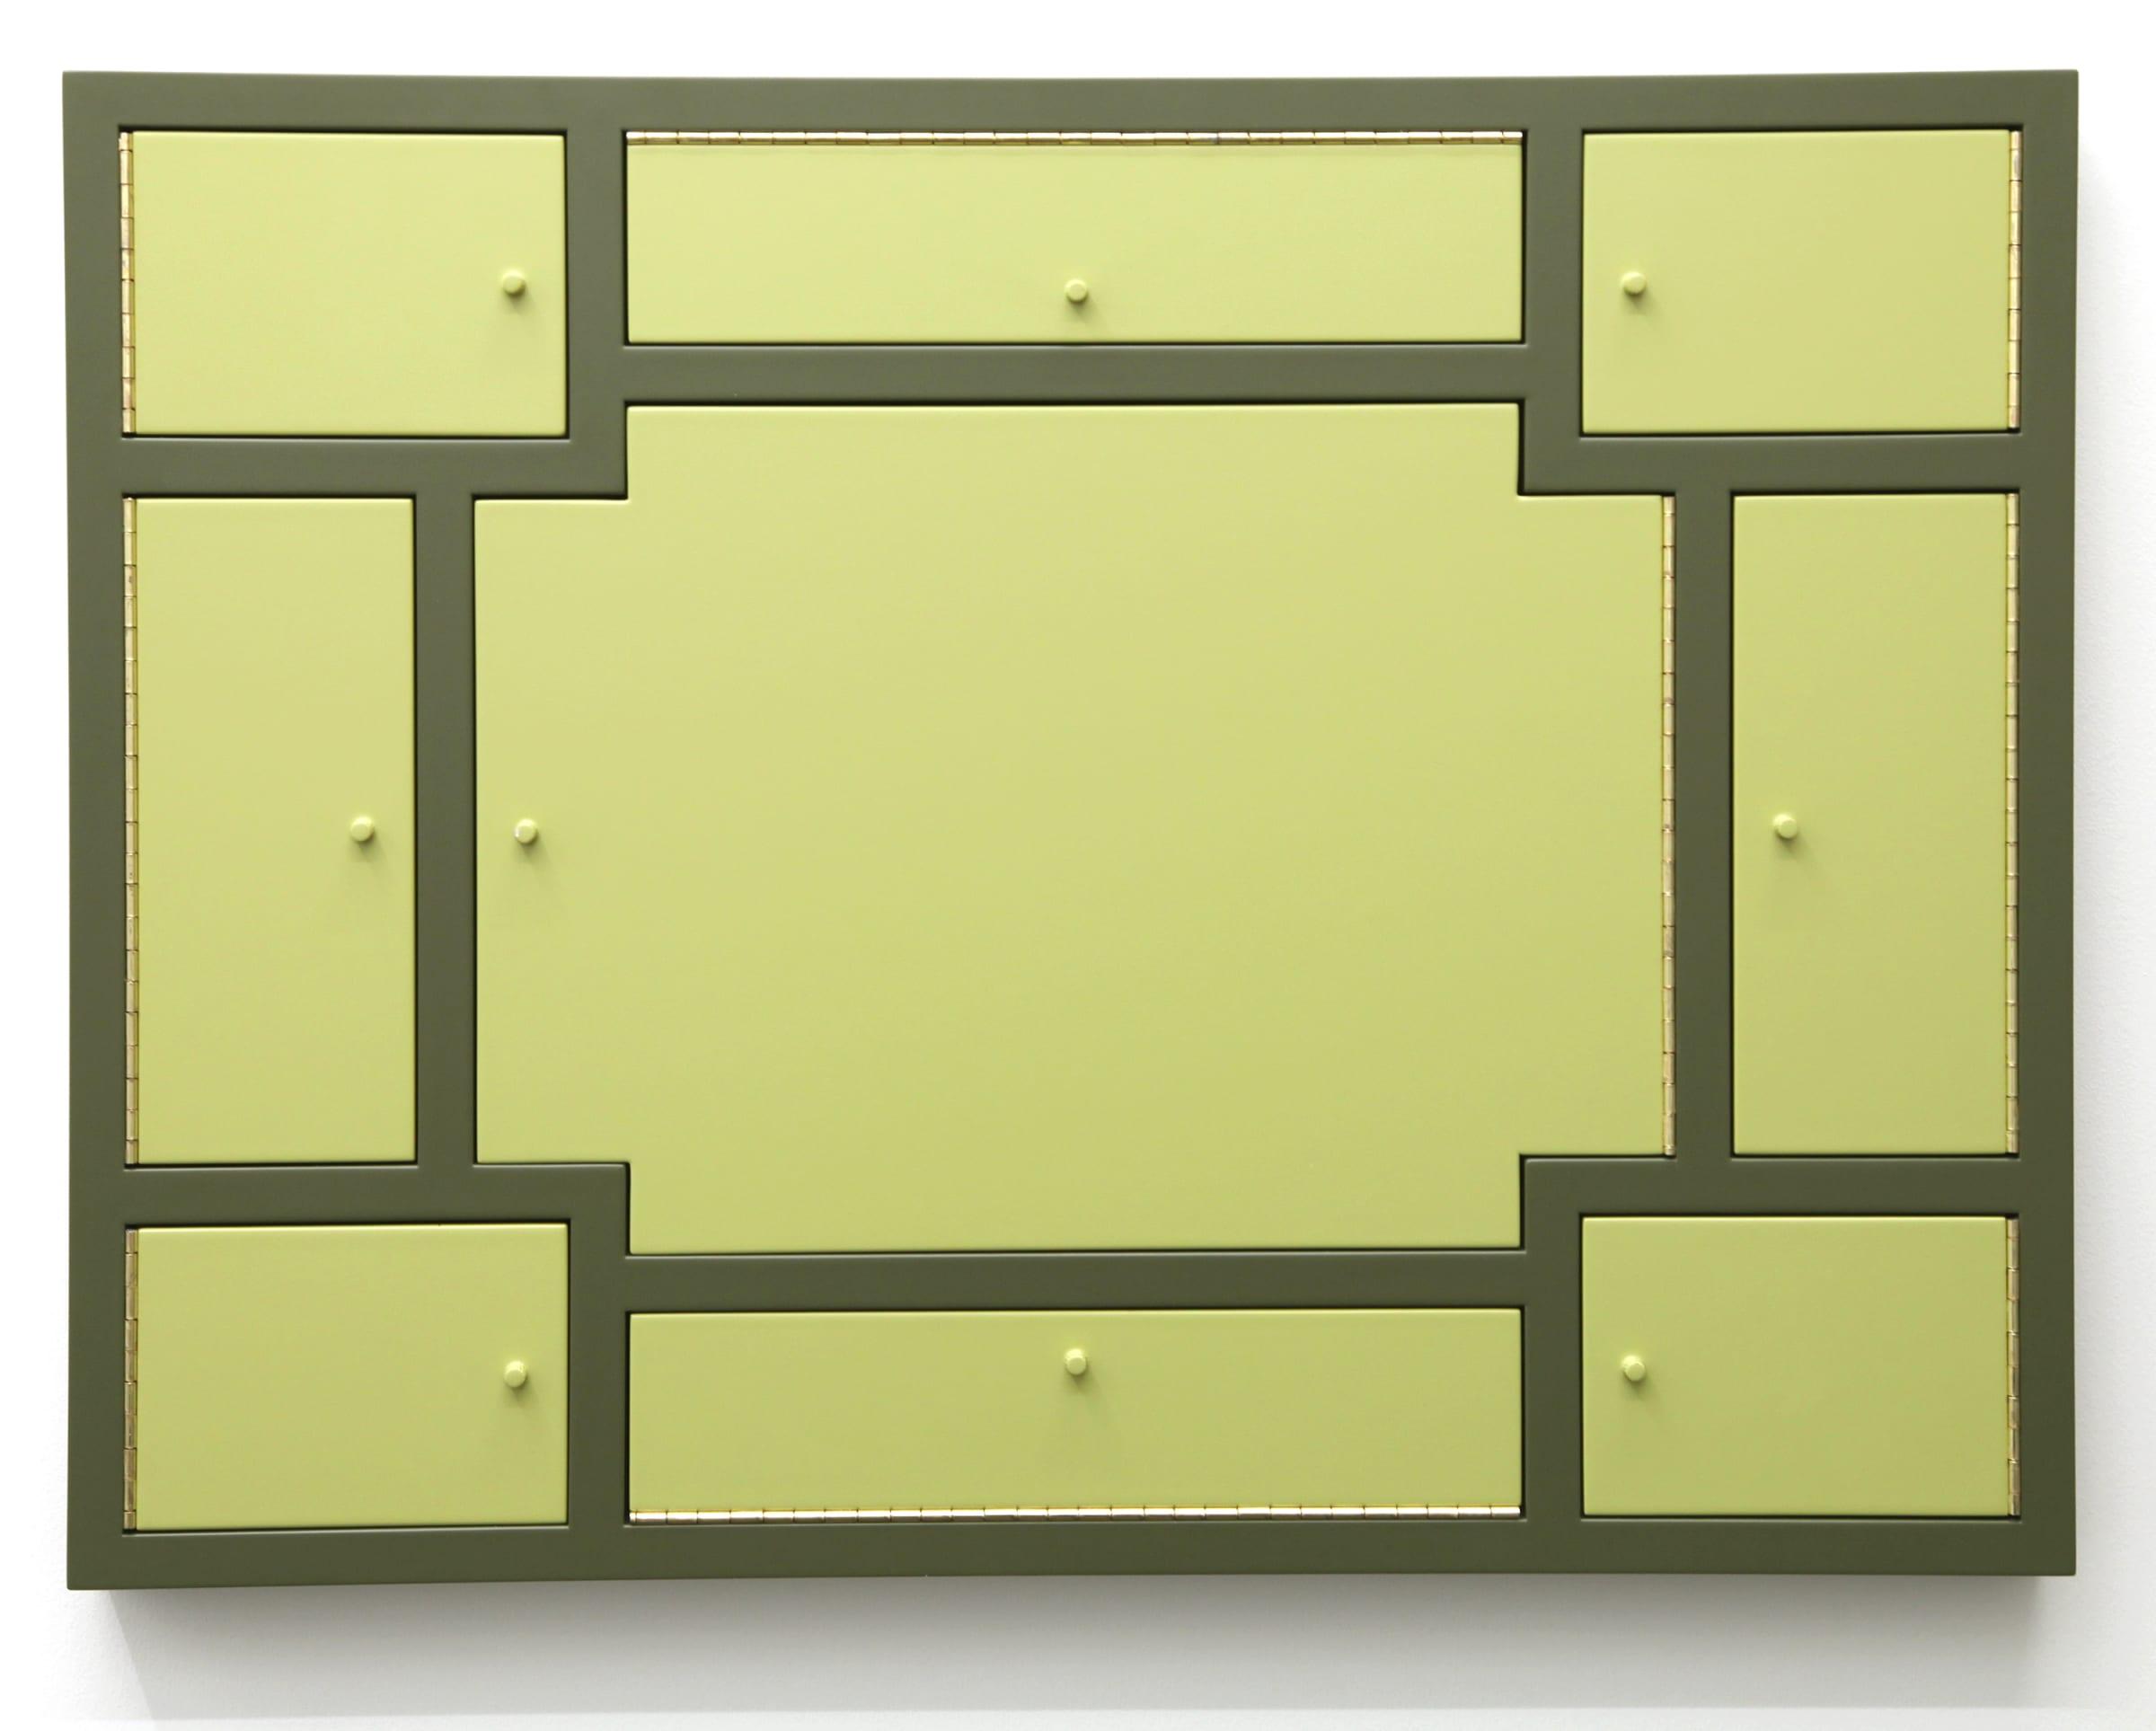 "<span class=""link fancybox-details-link""><a href=""/artists/129-birgir-andresson/works/6194/"">View Detail Page</a></span><div class=""artist""><strong>BIRGIR ANDRÉSSON</strong></div> <div class=""title""><em>Cabinet No. 17</em>, 2000</div> <div class=""medium"">MDF, varnish</div> <div class=""dimensions"">60 x 80 x 6 cm<br /> 23 5/8 x 31 1/2 x 2 3/8 in</div>"